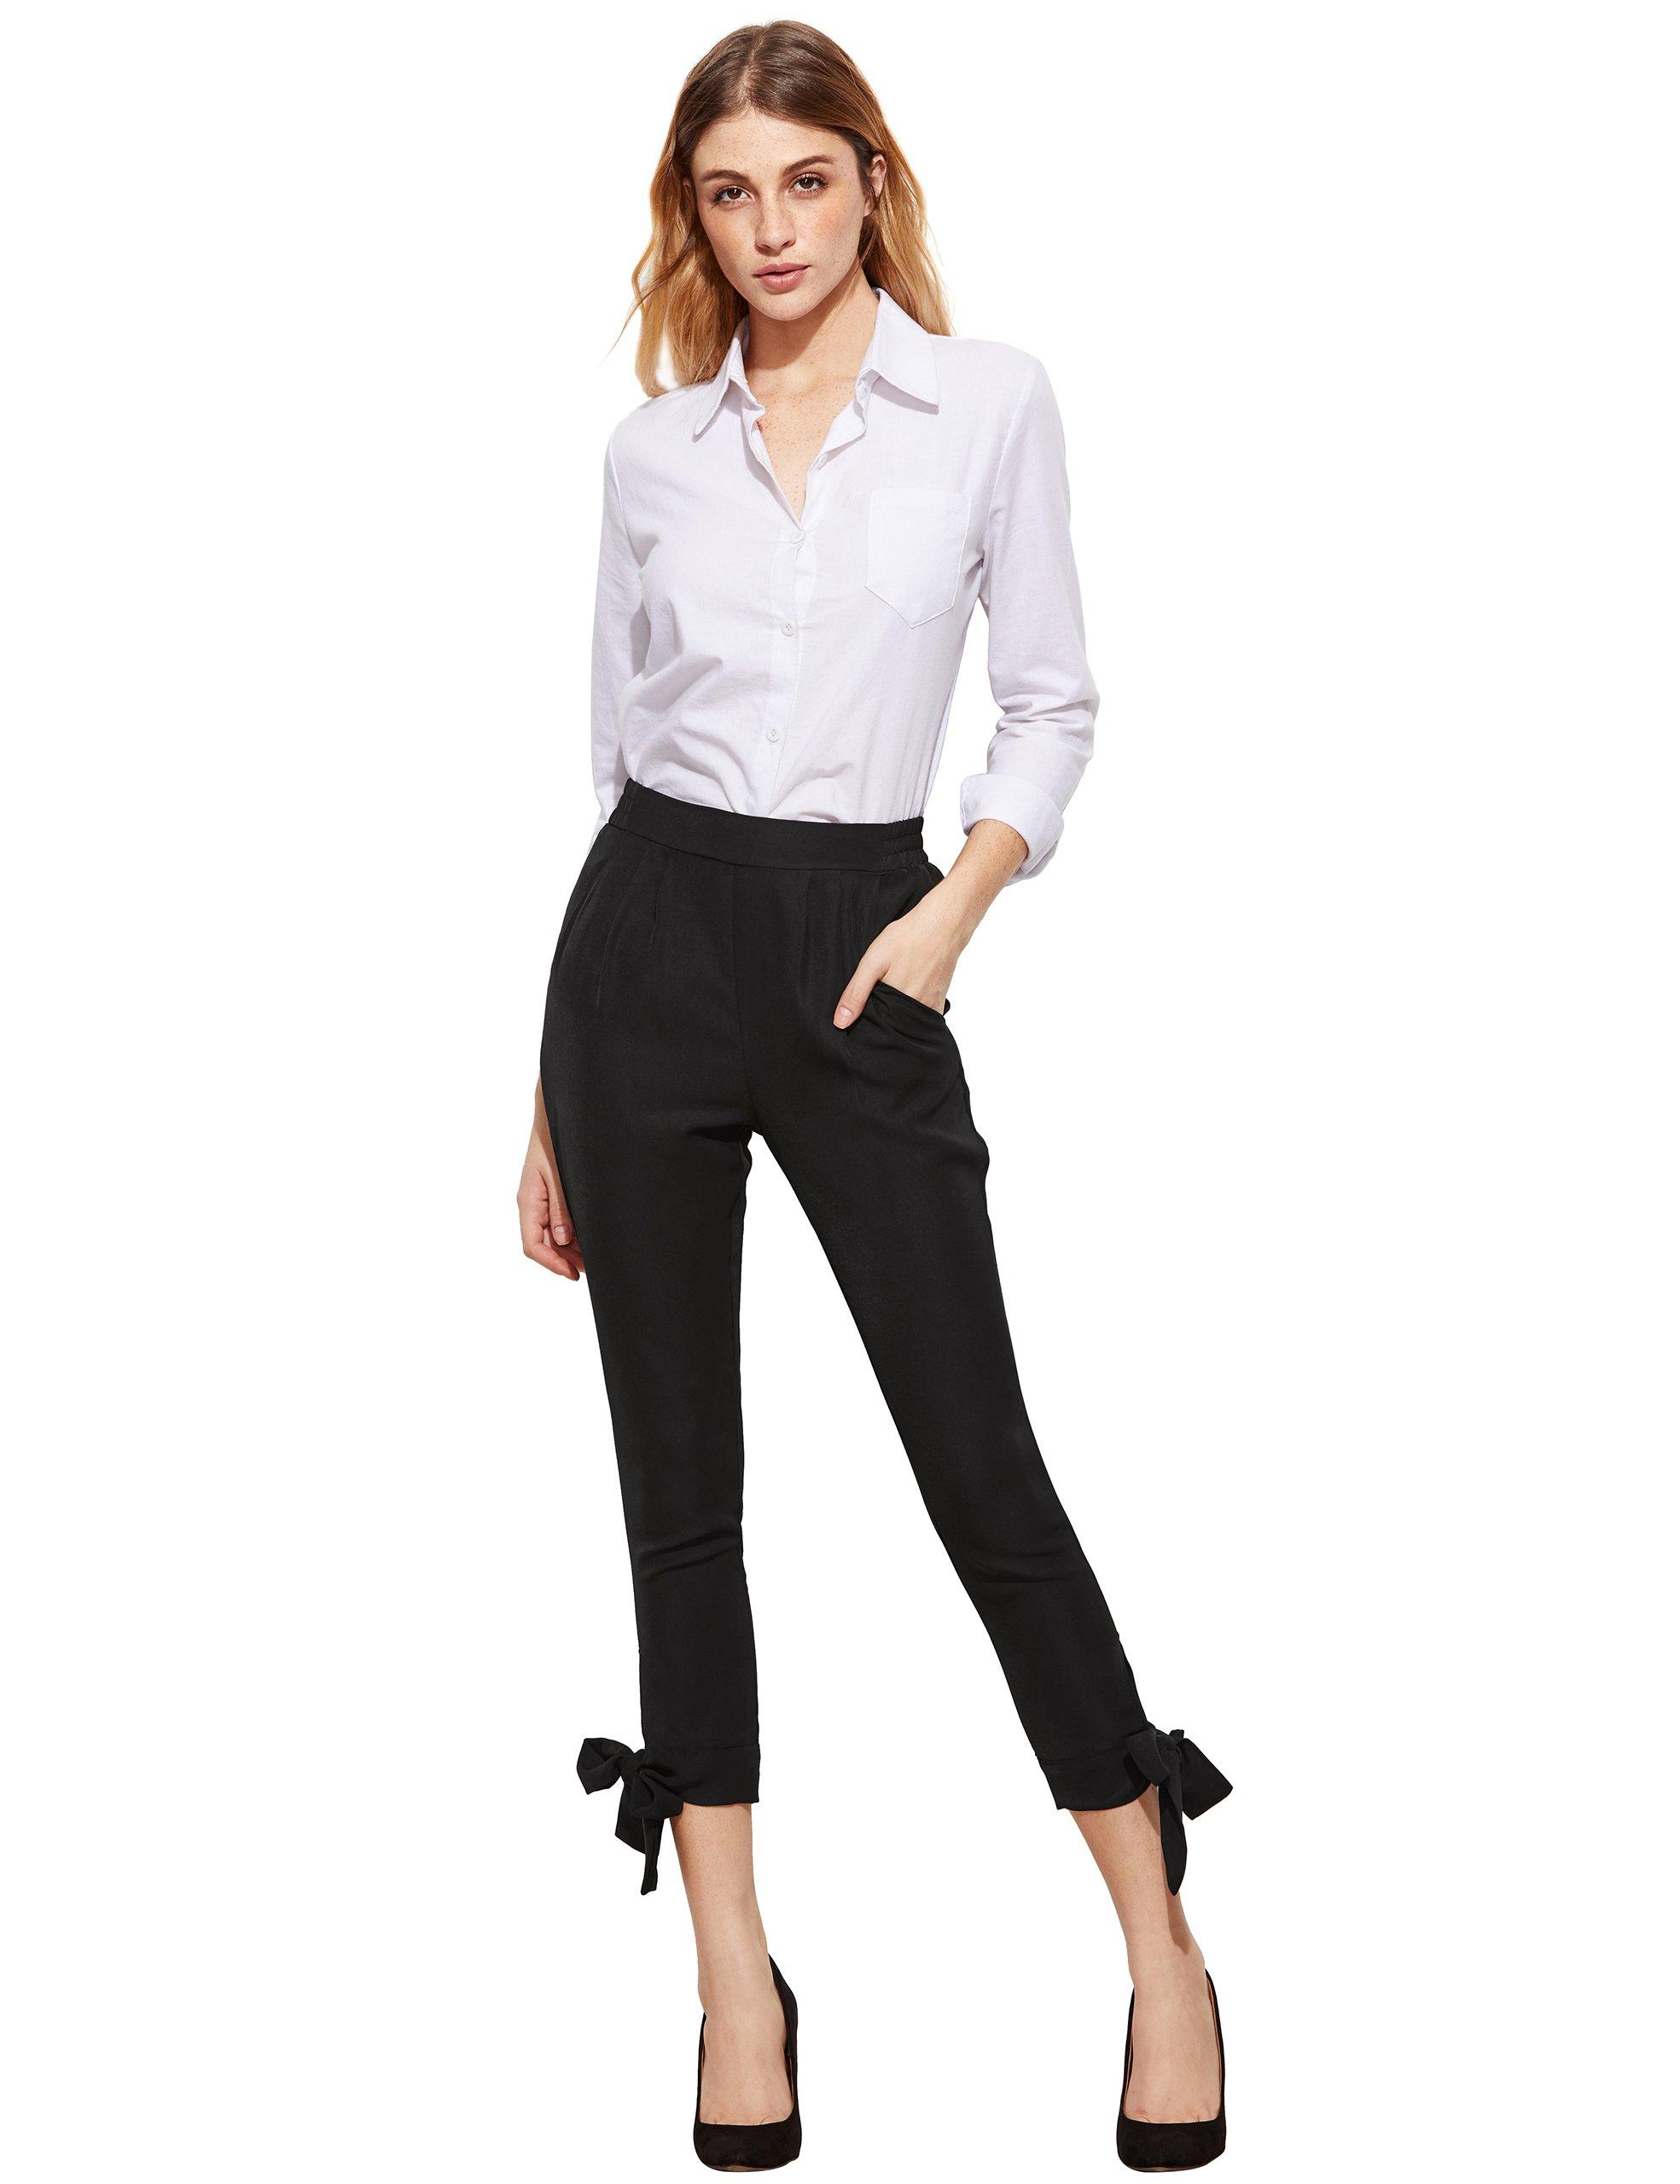 SheIn Women's Elastic Waist Comfy Bow Tie Hem Crop Skinny Pants with Pockets Small Black by SheIn (Image #2)